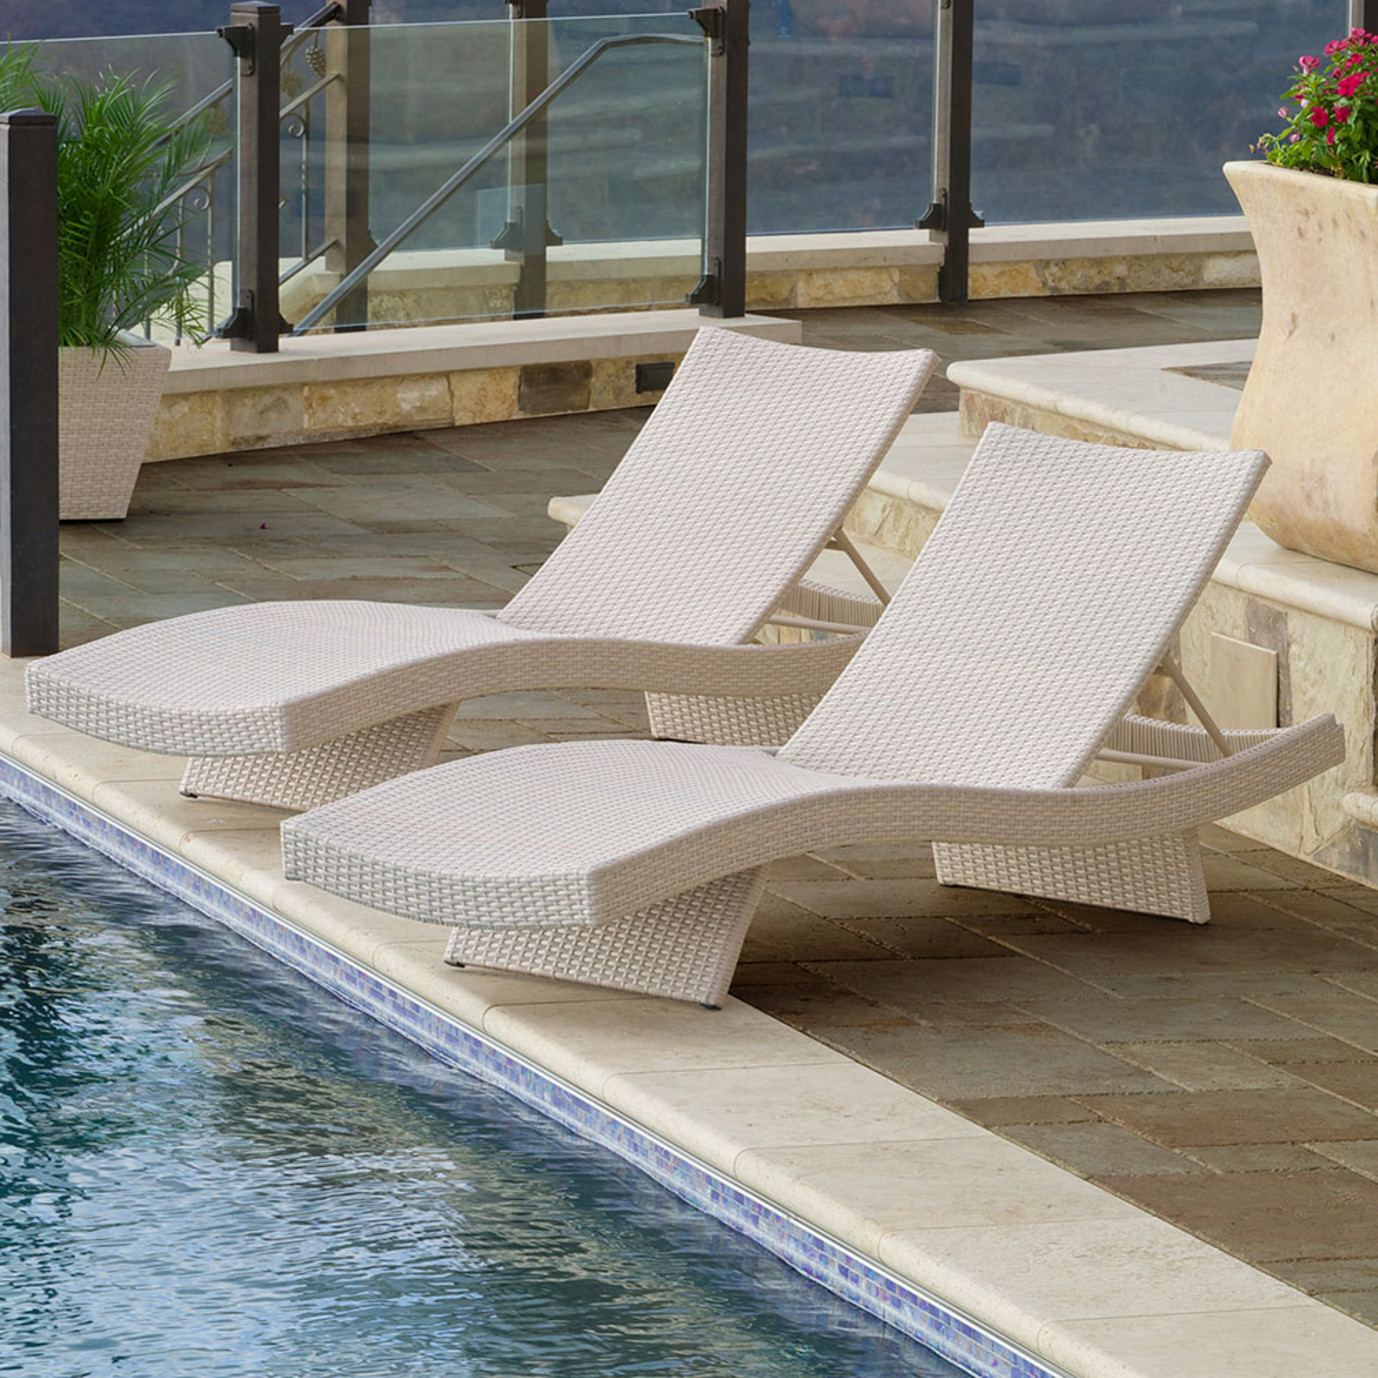 Portofino™ Comfort 2pk Chaise Lounge Chairs - Chalk